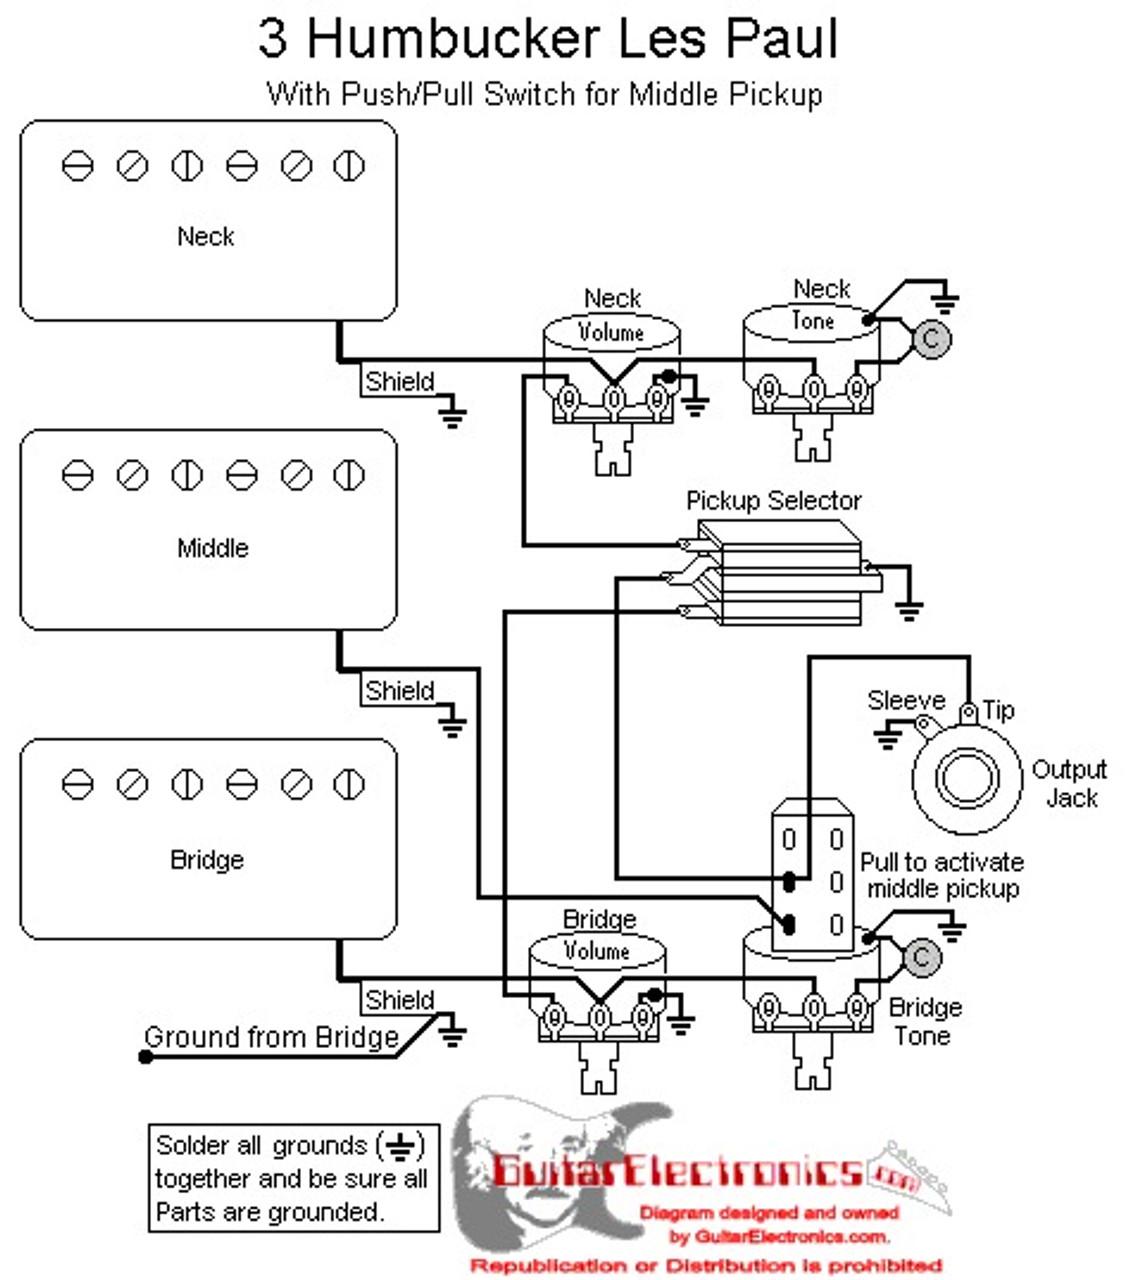 wdu hhh3t22 02  hhh strat wiring diagram #8